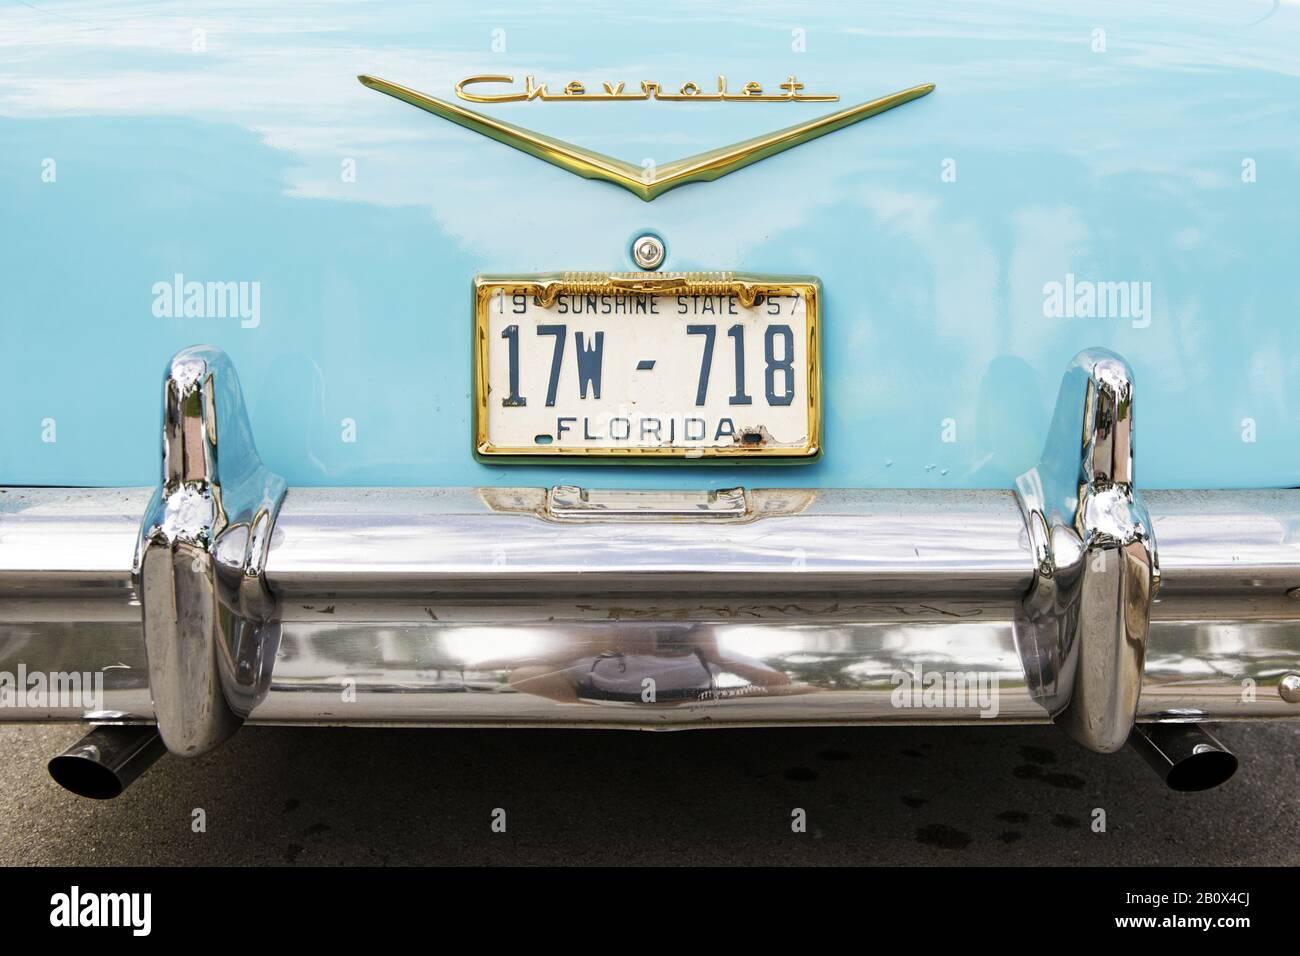 Rear view, Chevrolet Bel Air, built in 1957, fifties, classic American car, Ocean Drive, Miami South Beach, Art Deco District, Florida, USA, Stock Photo